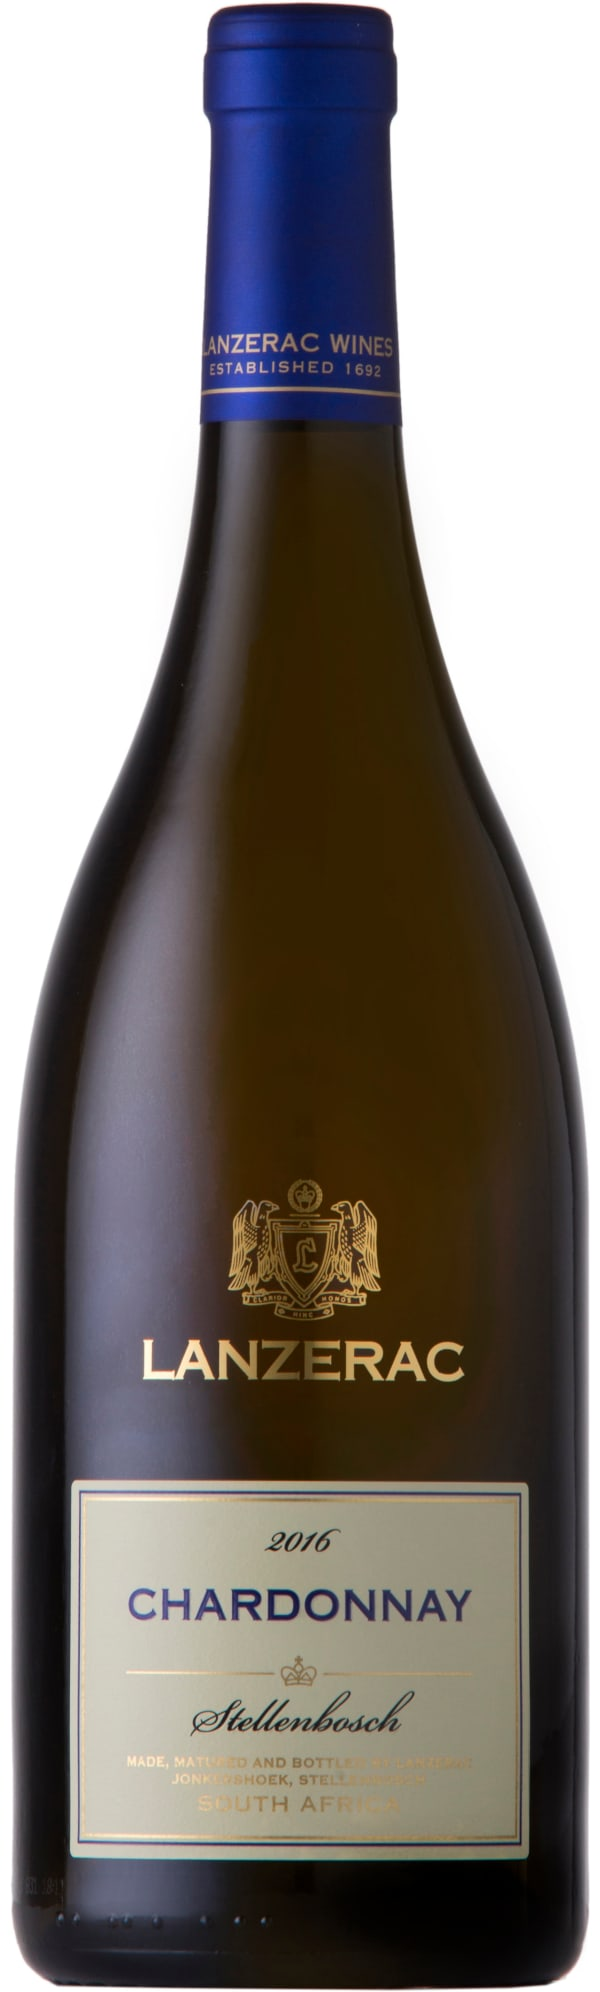 Lanzerac Chardonnay 2016